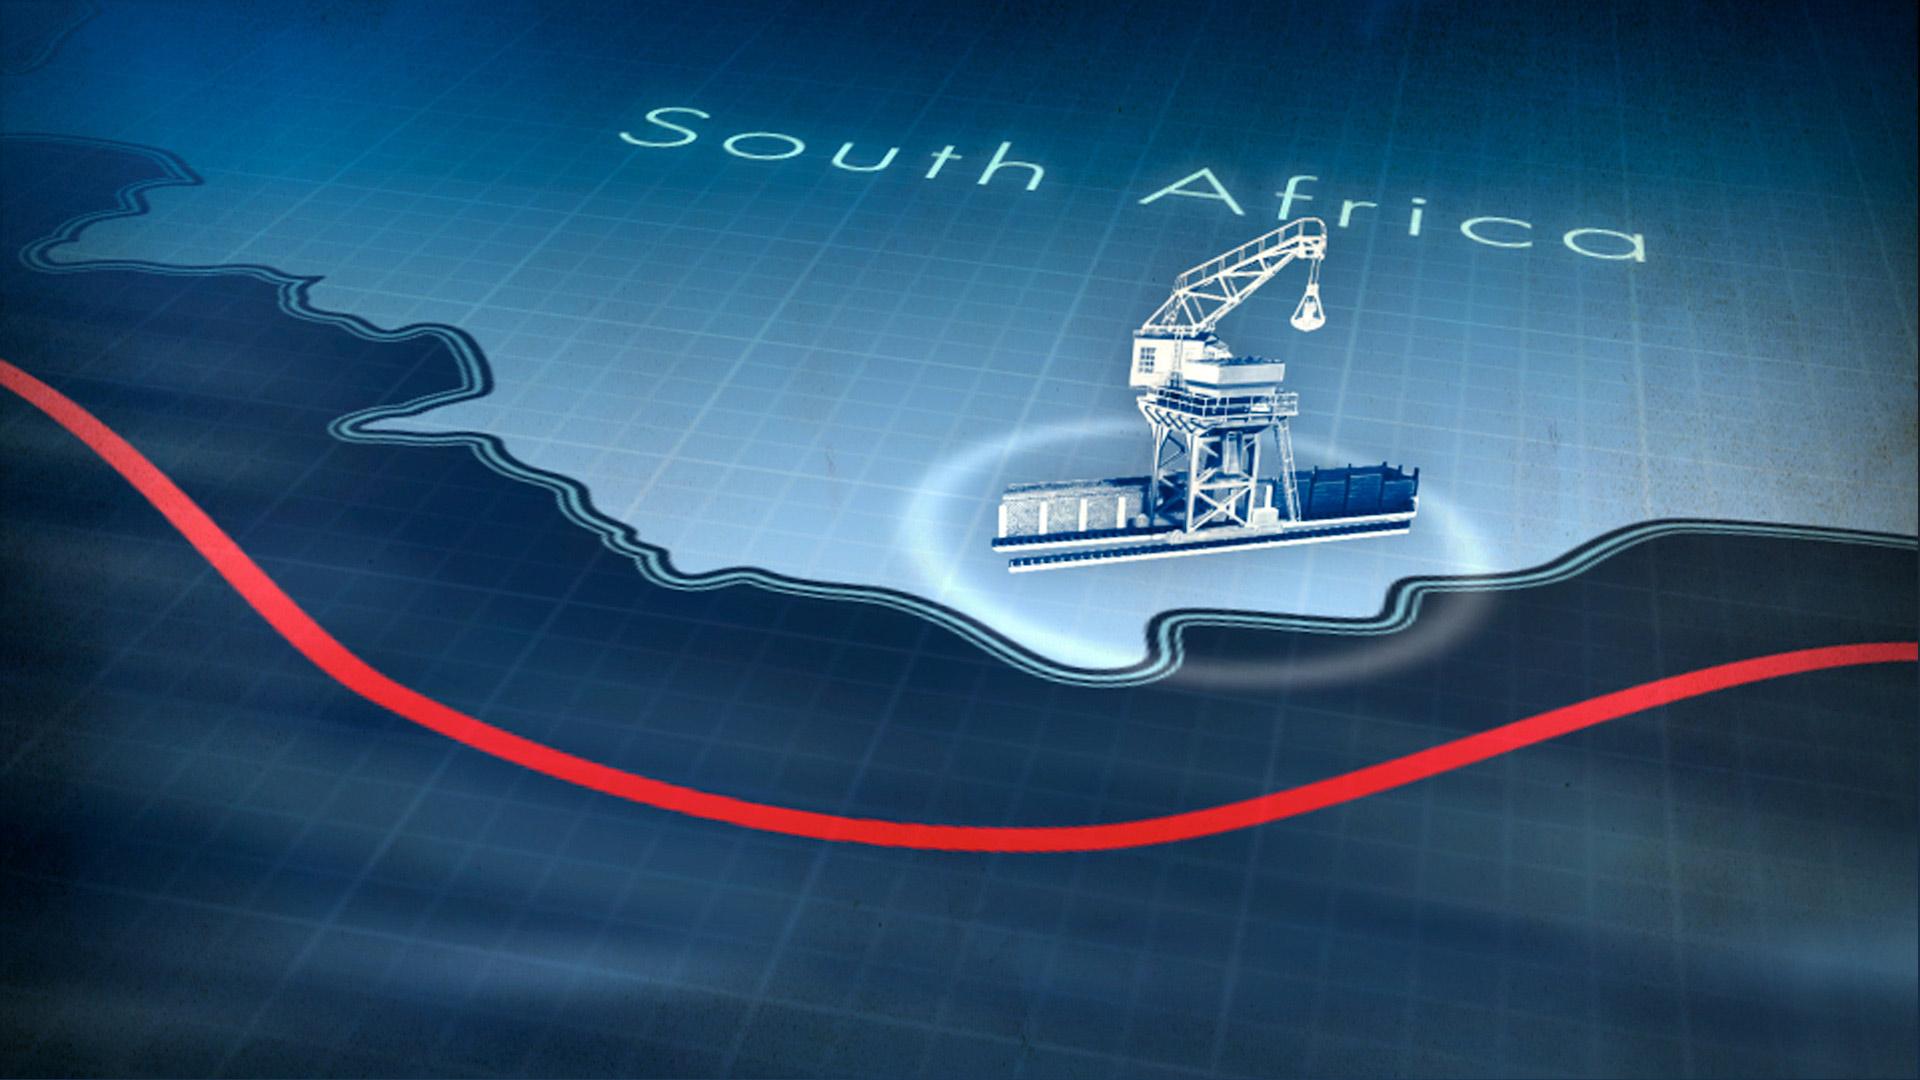 Roxanne-Silverwood-WINTON-Shipping-Sea-changes_9